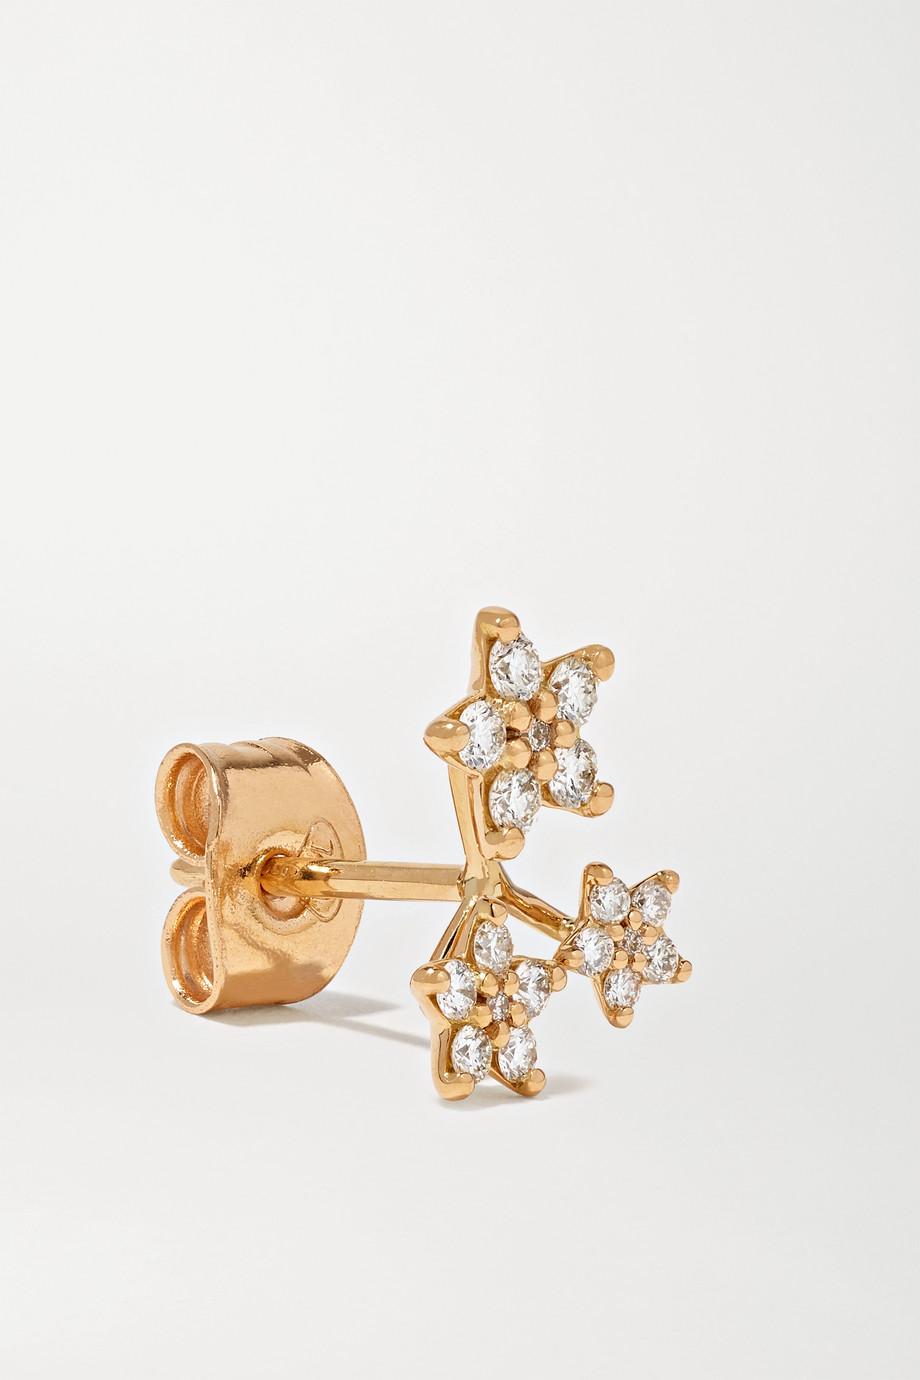 OLE LYNGGAARD COPENHAGEN Shooting Stars 18-karat gold diamond earring